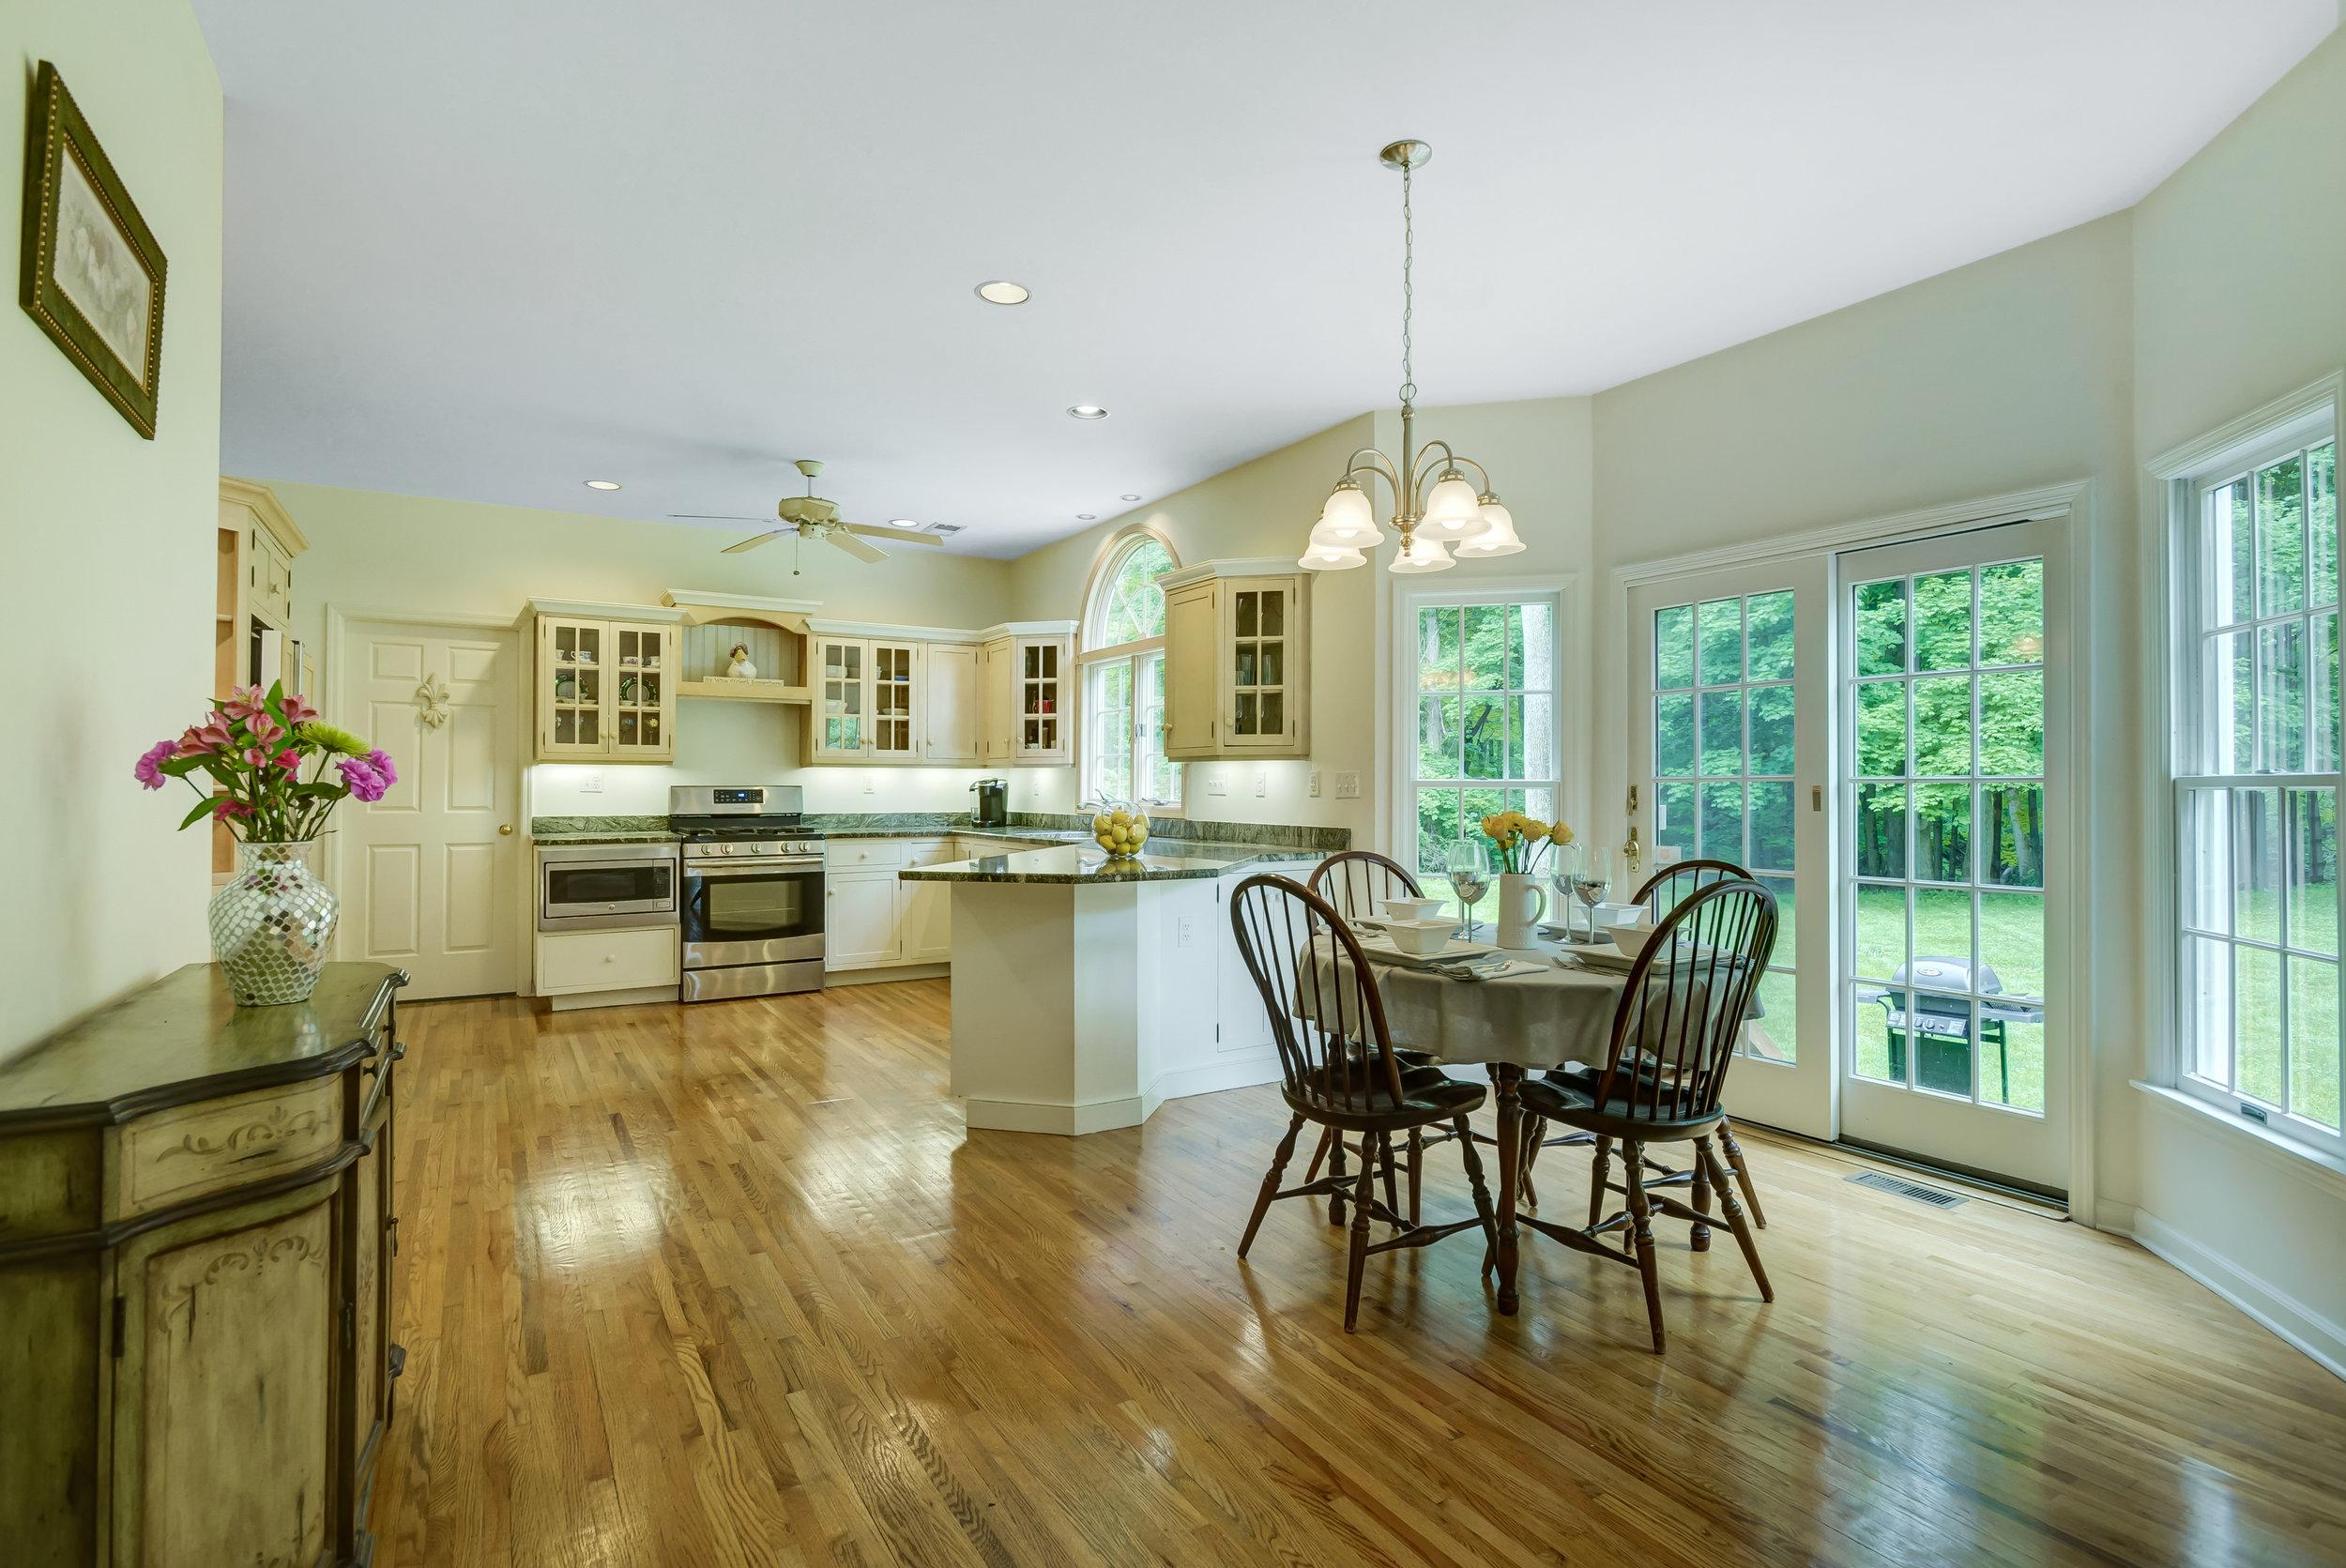 11 Kitchen and Breakfast room _DSC5060_1_2_3_4.jpg